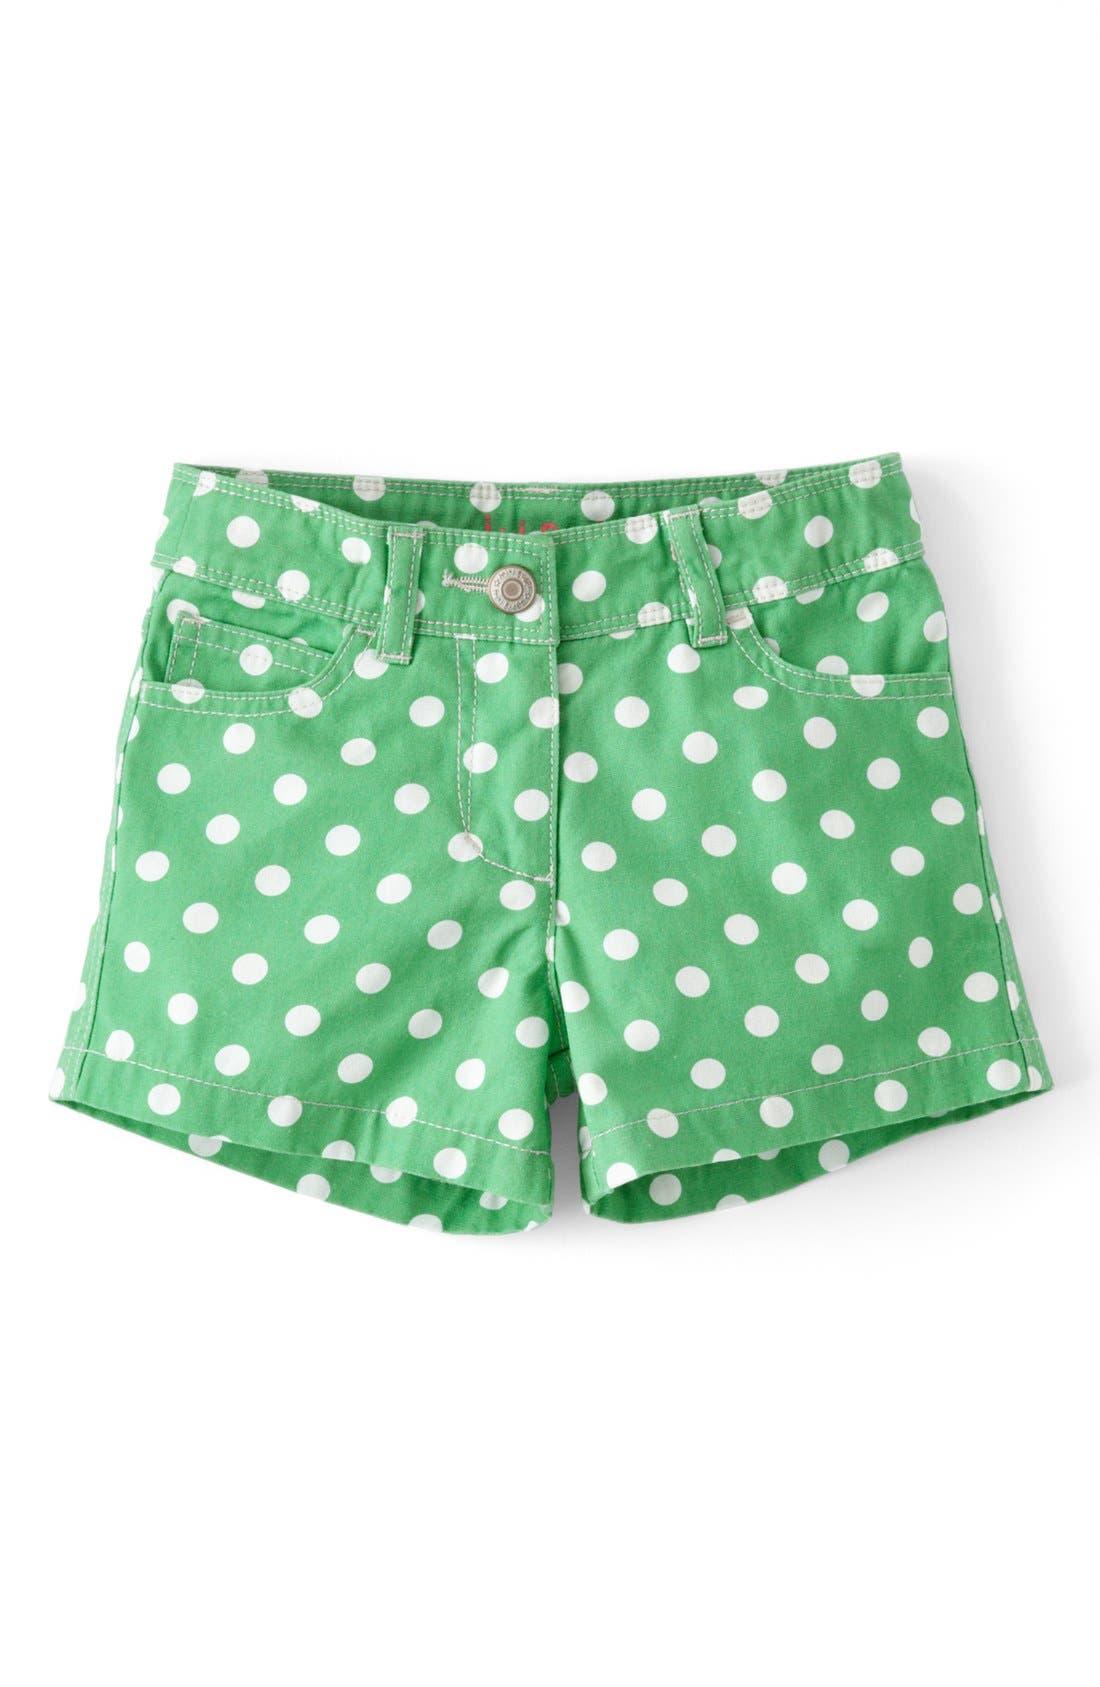 Main Image - Mini Boden Heart Pocket Shorts (Toddler Girls, Little Girls & Big Girls)(Online Only)